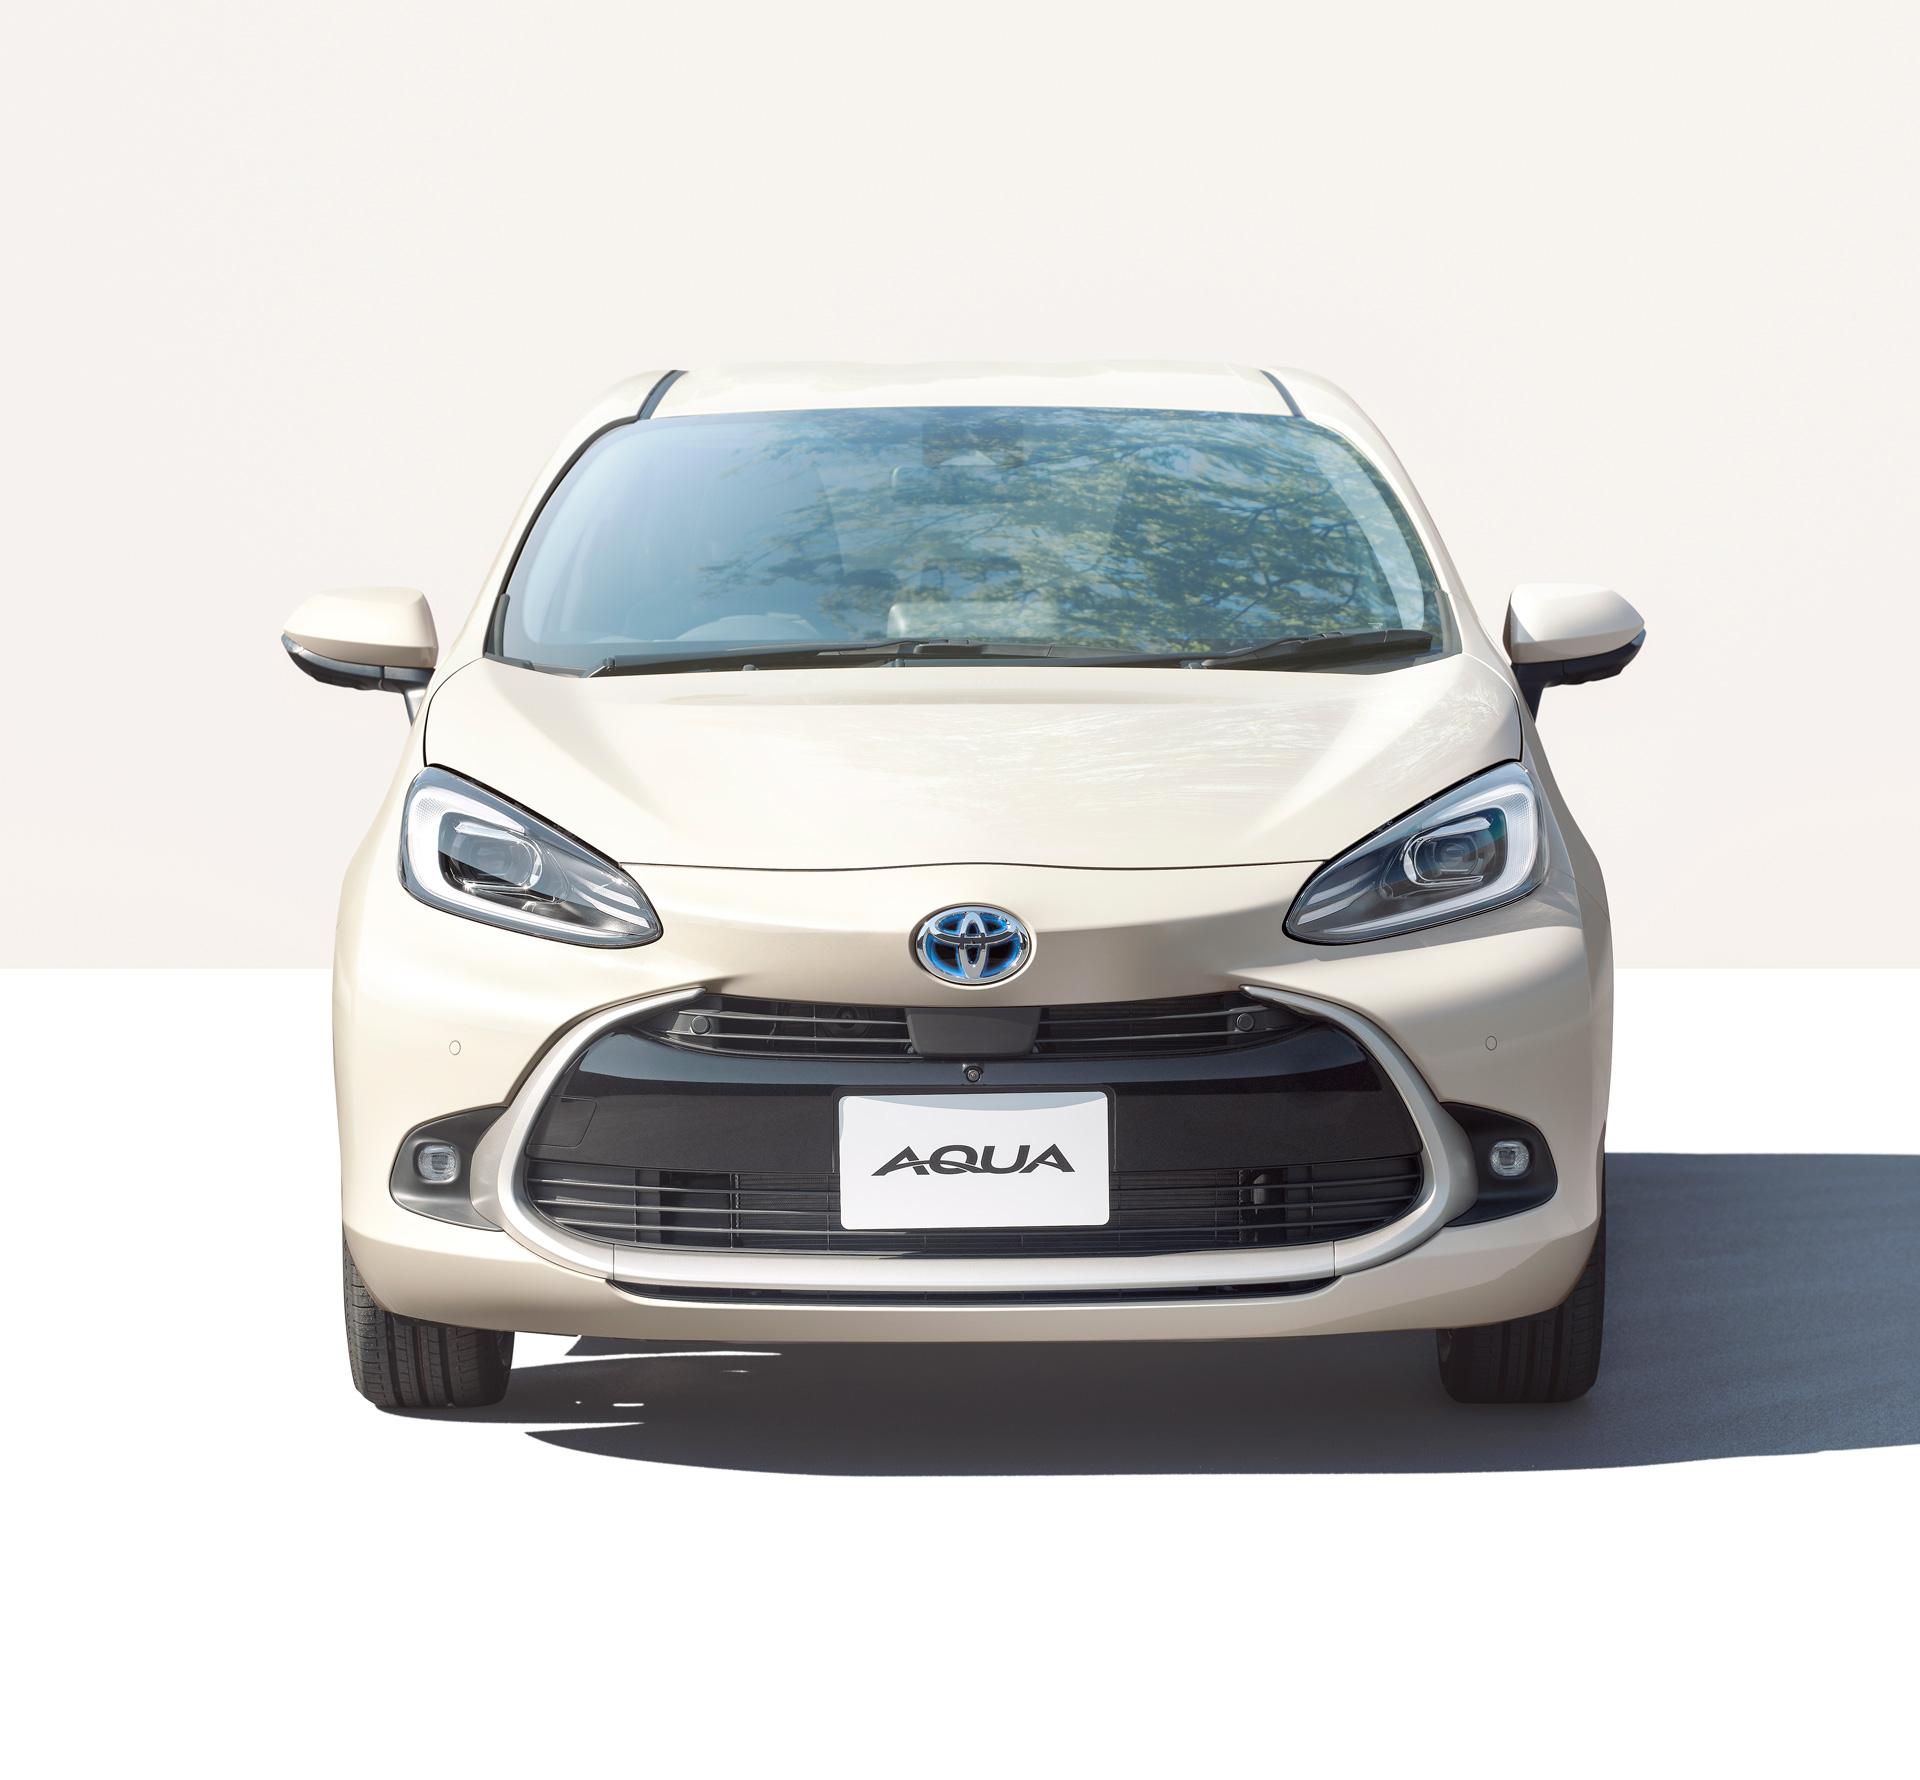 Toyota to Launch All-New Aqua - Image 6